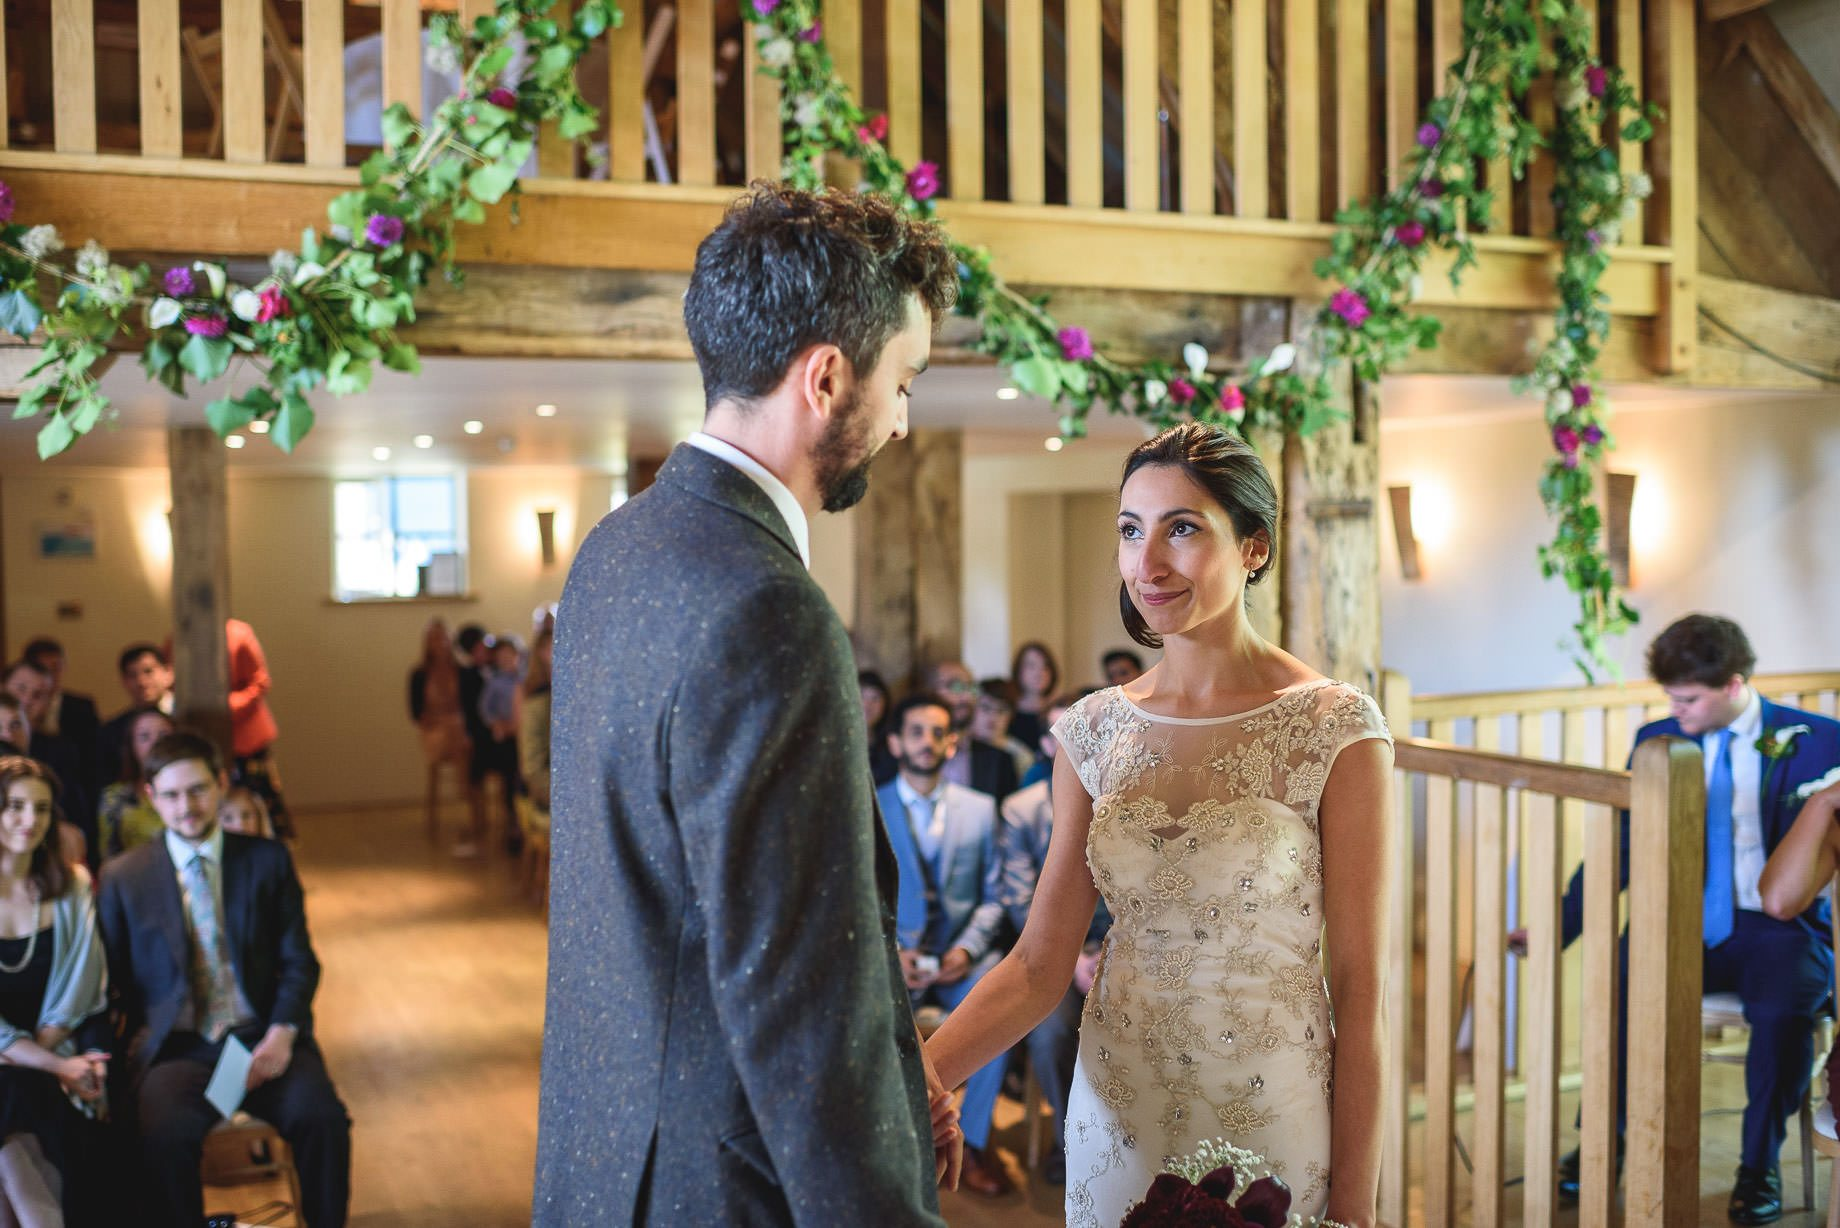 bury-court-barn-wedding-photography-guy-collier-photography-nadia-tom-53-of-184